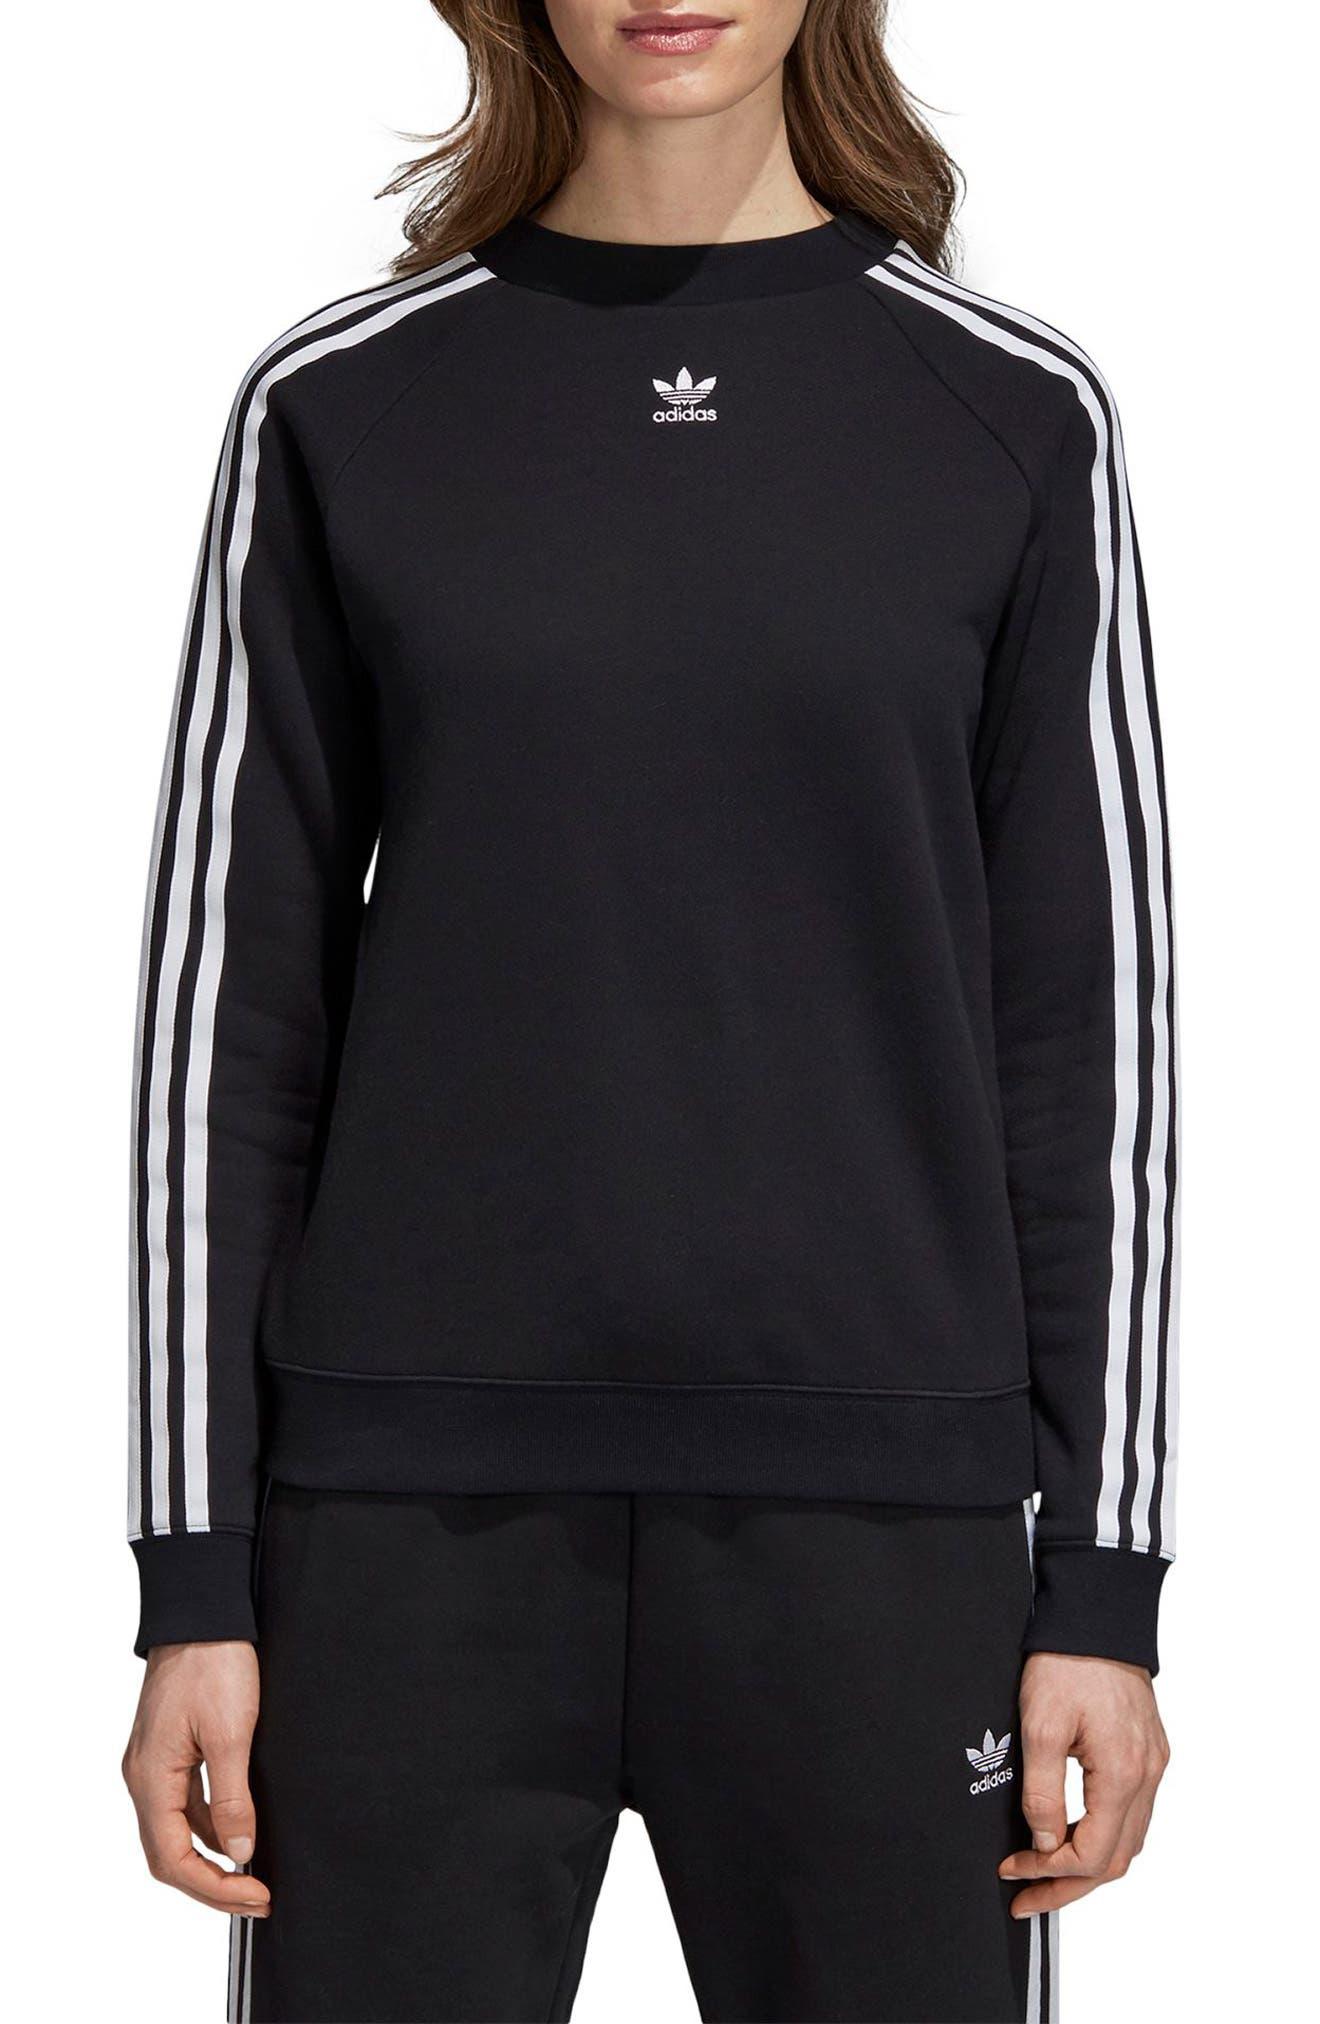 TRF Sweatshirt,                         Main,                         color, BLACK